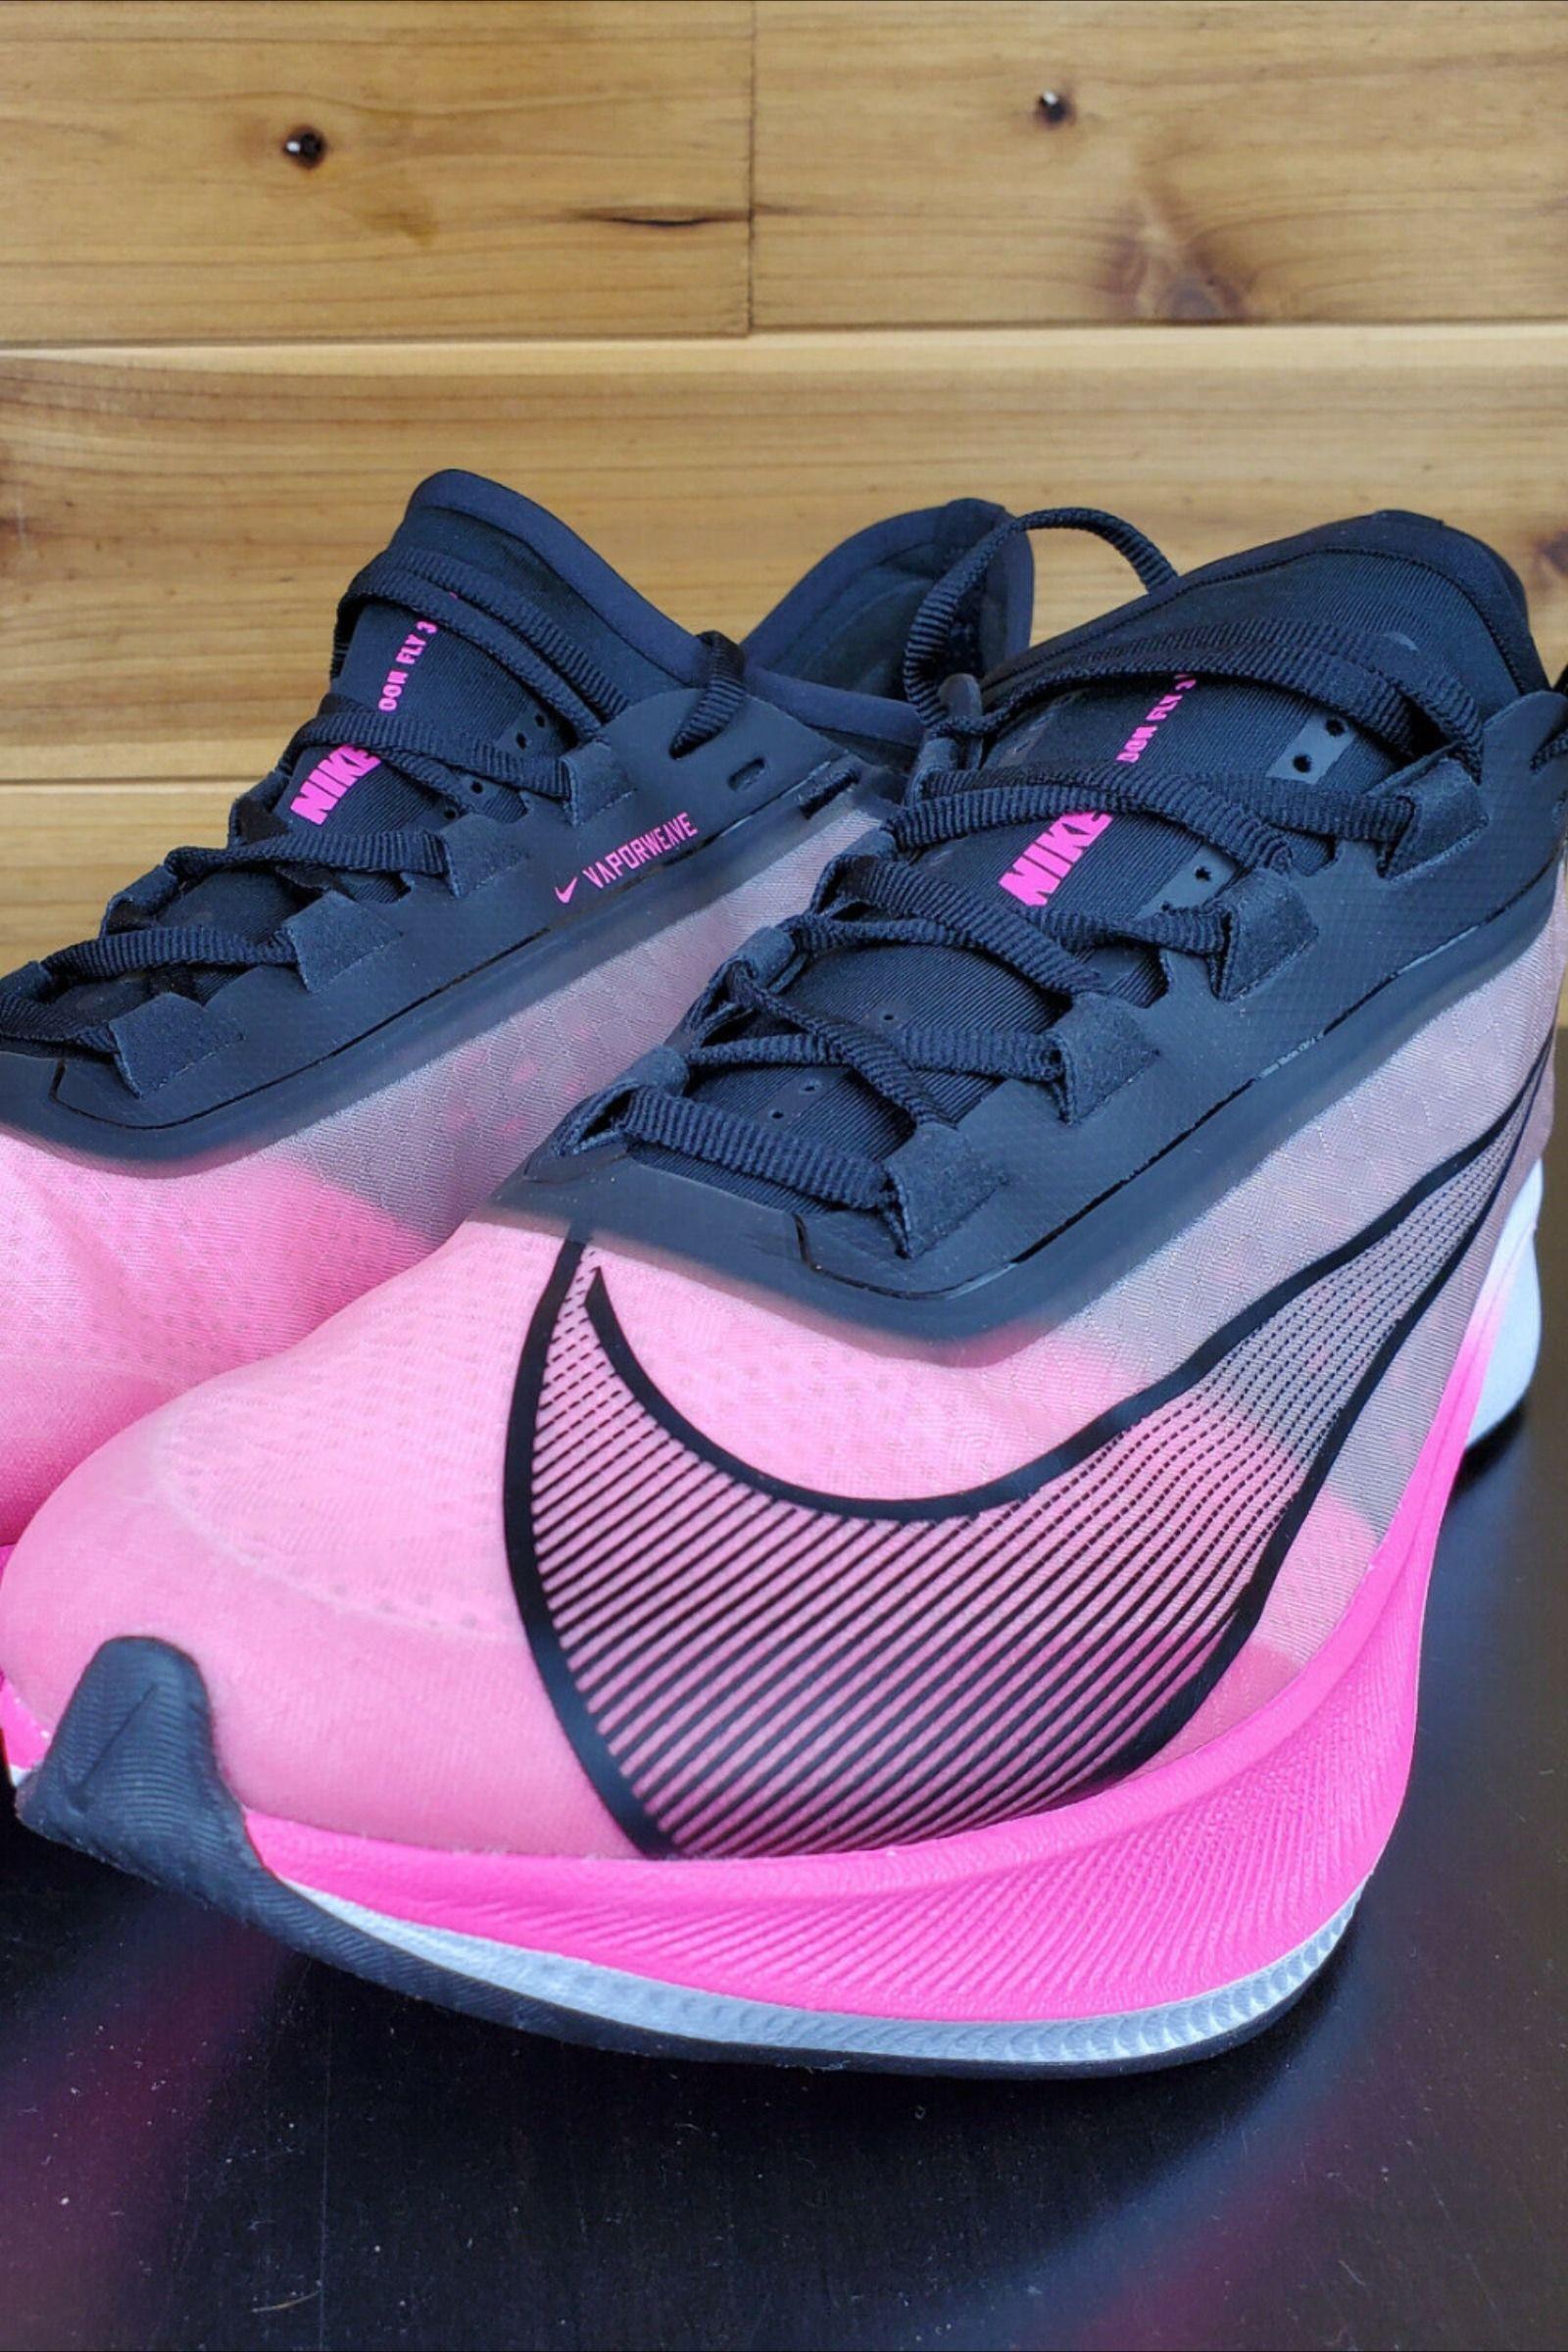 evidencia Sala cortesía  Nike Zoom Fly 3 Pink Blast Black Grey VaporWeave Mens Running Shoes  AT8240-600   Running shoes for men, Running shoes, Nike zoom